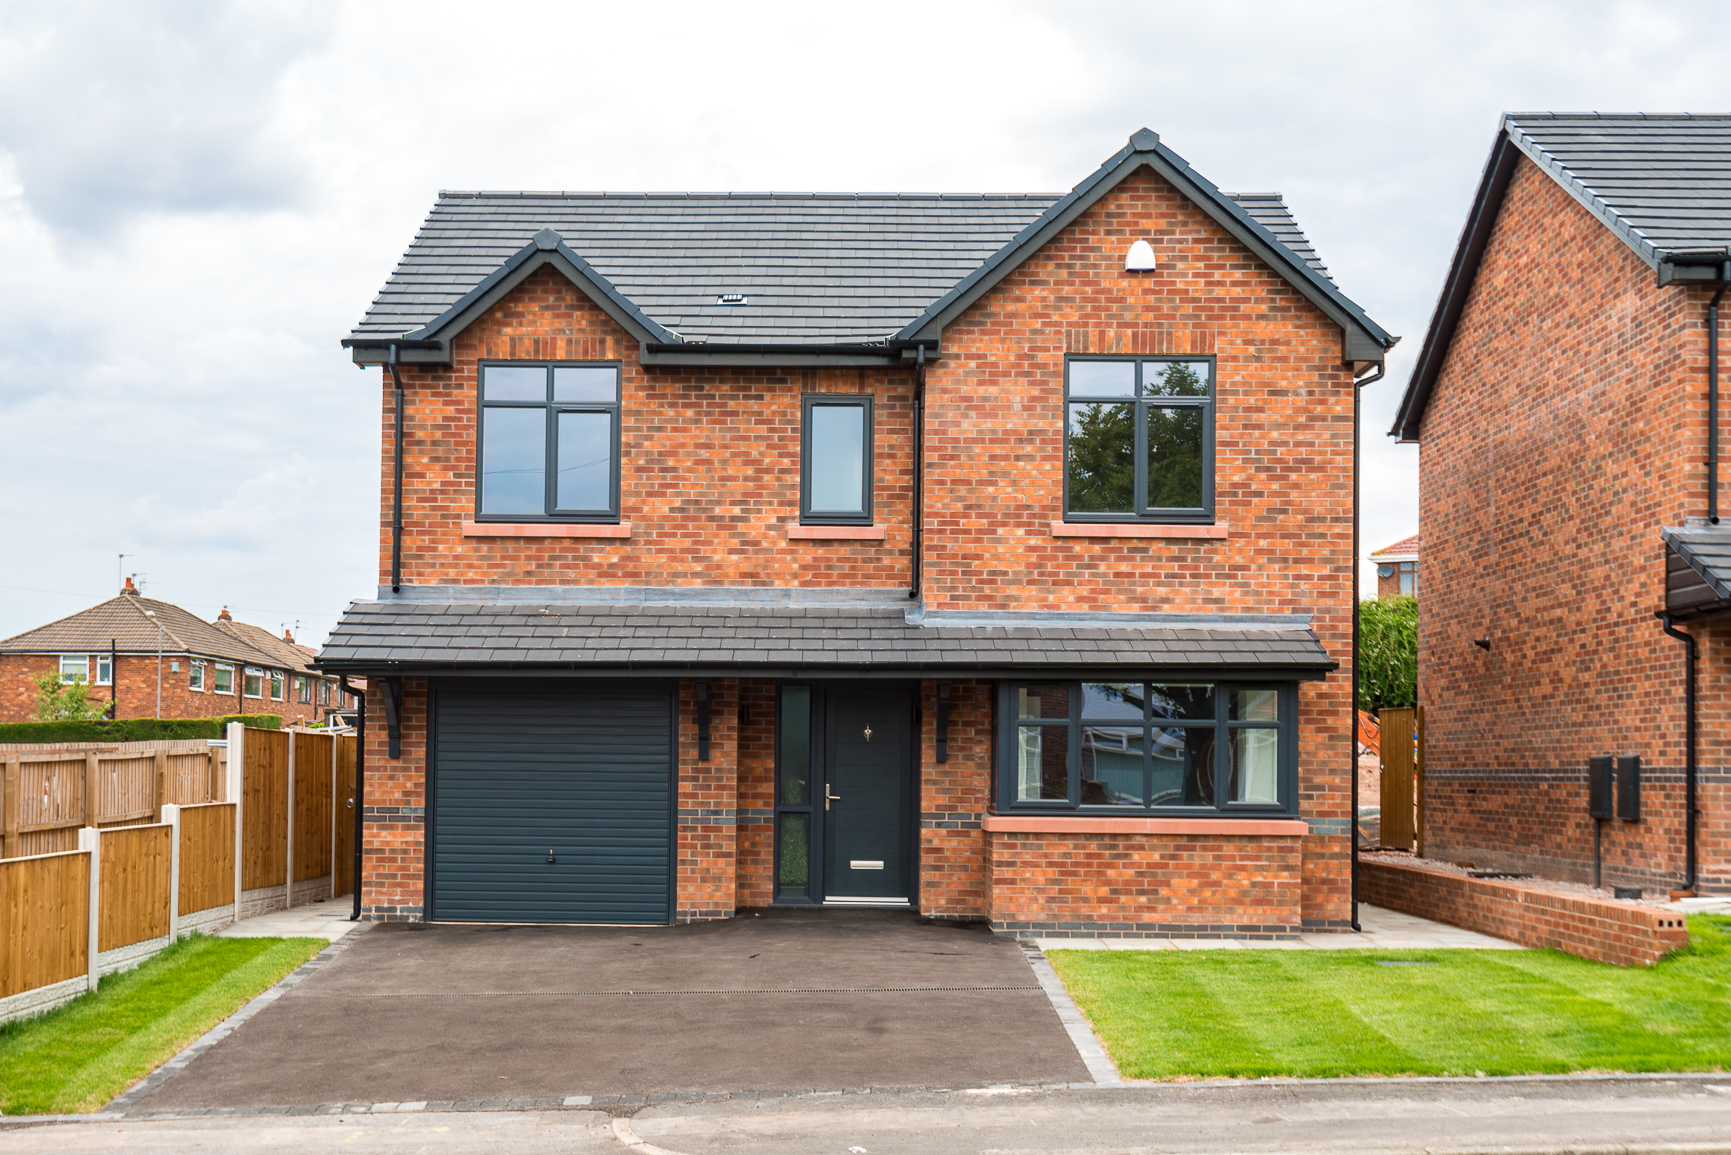 new family homes in st helens